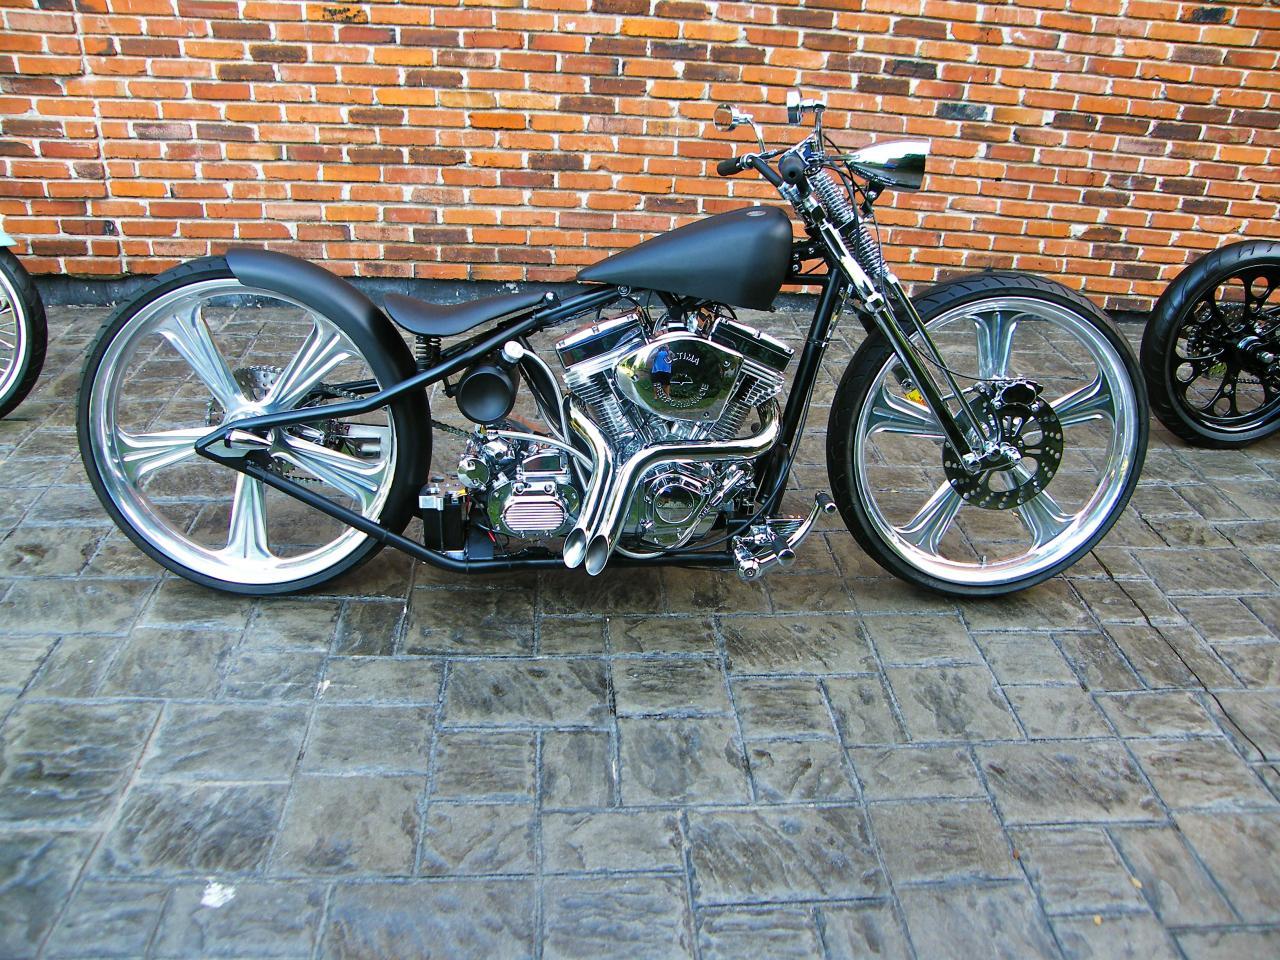 American Chopper Bike DSCF4563.296180712_large